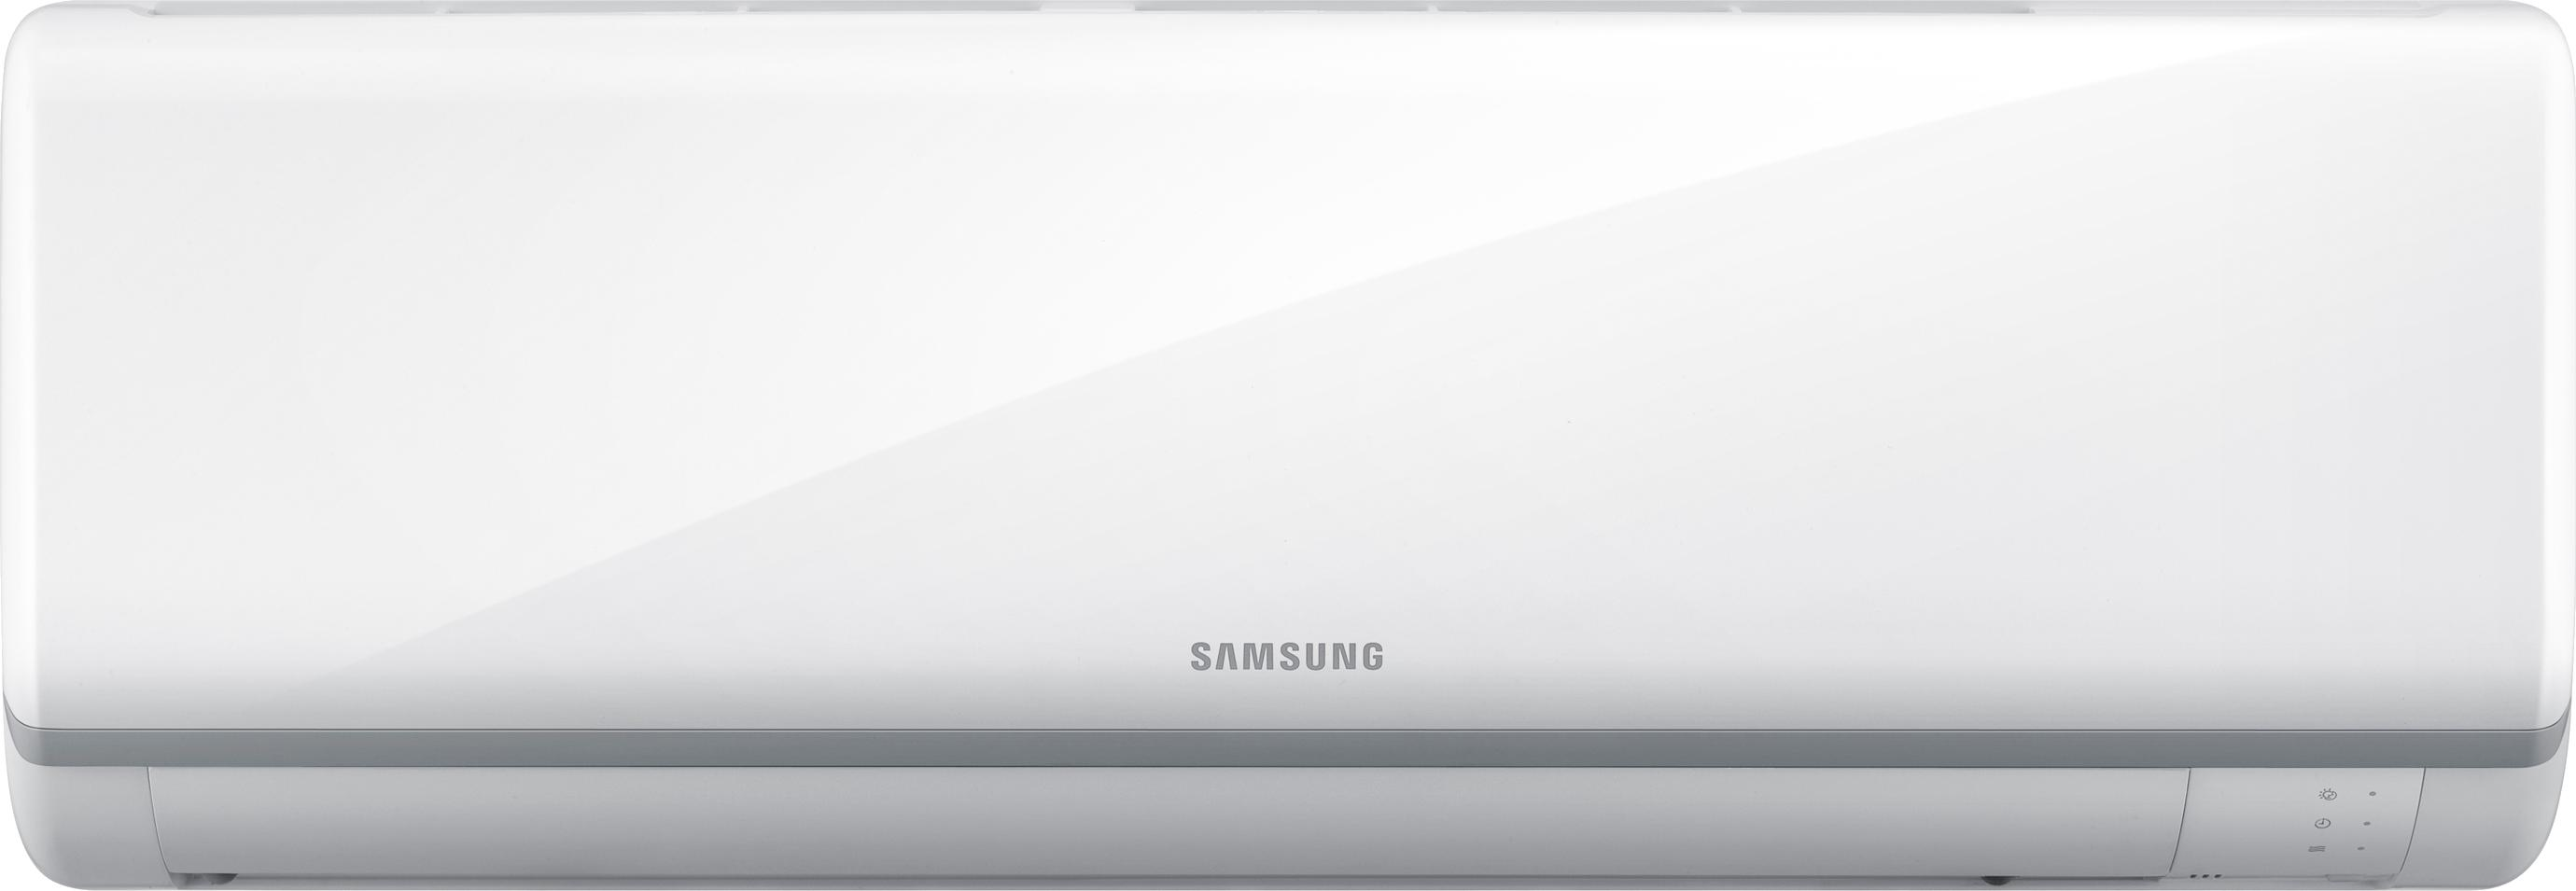 Samsung AQ24TSL